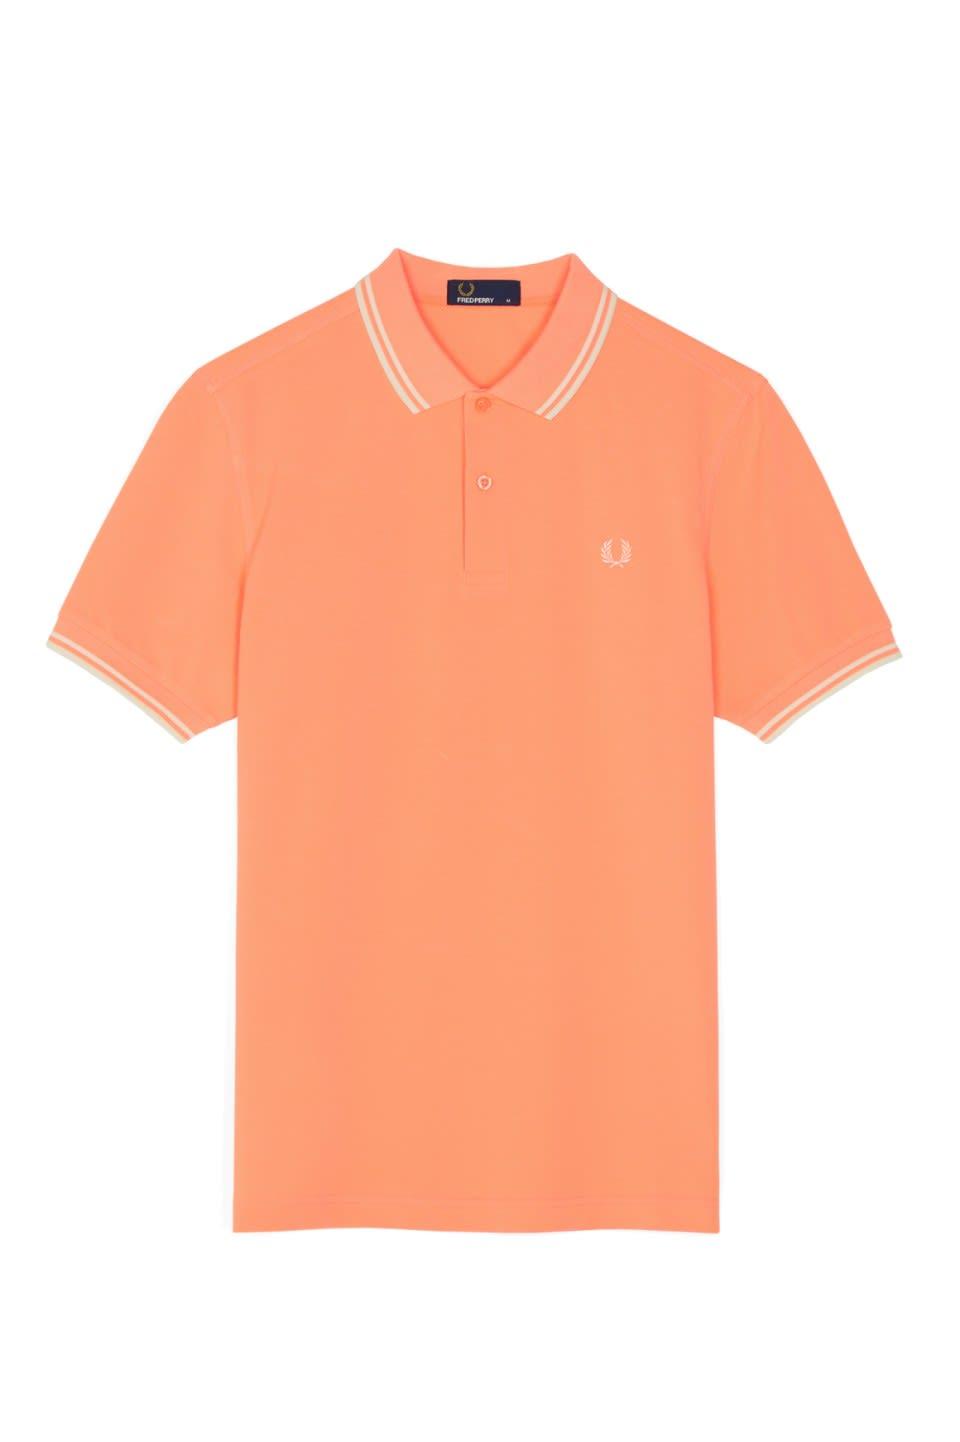 bdb0d95c Trouva: M3600 Nectar Polo Shirt